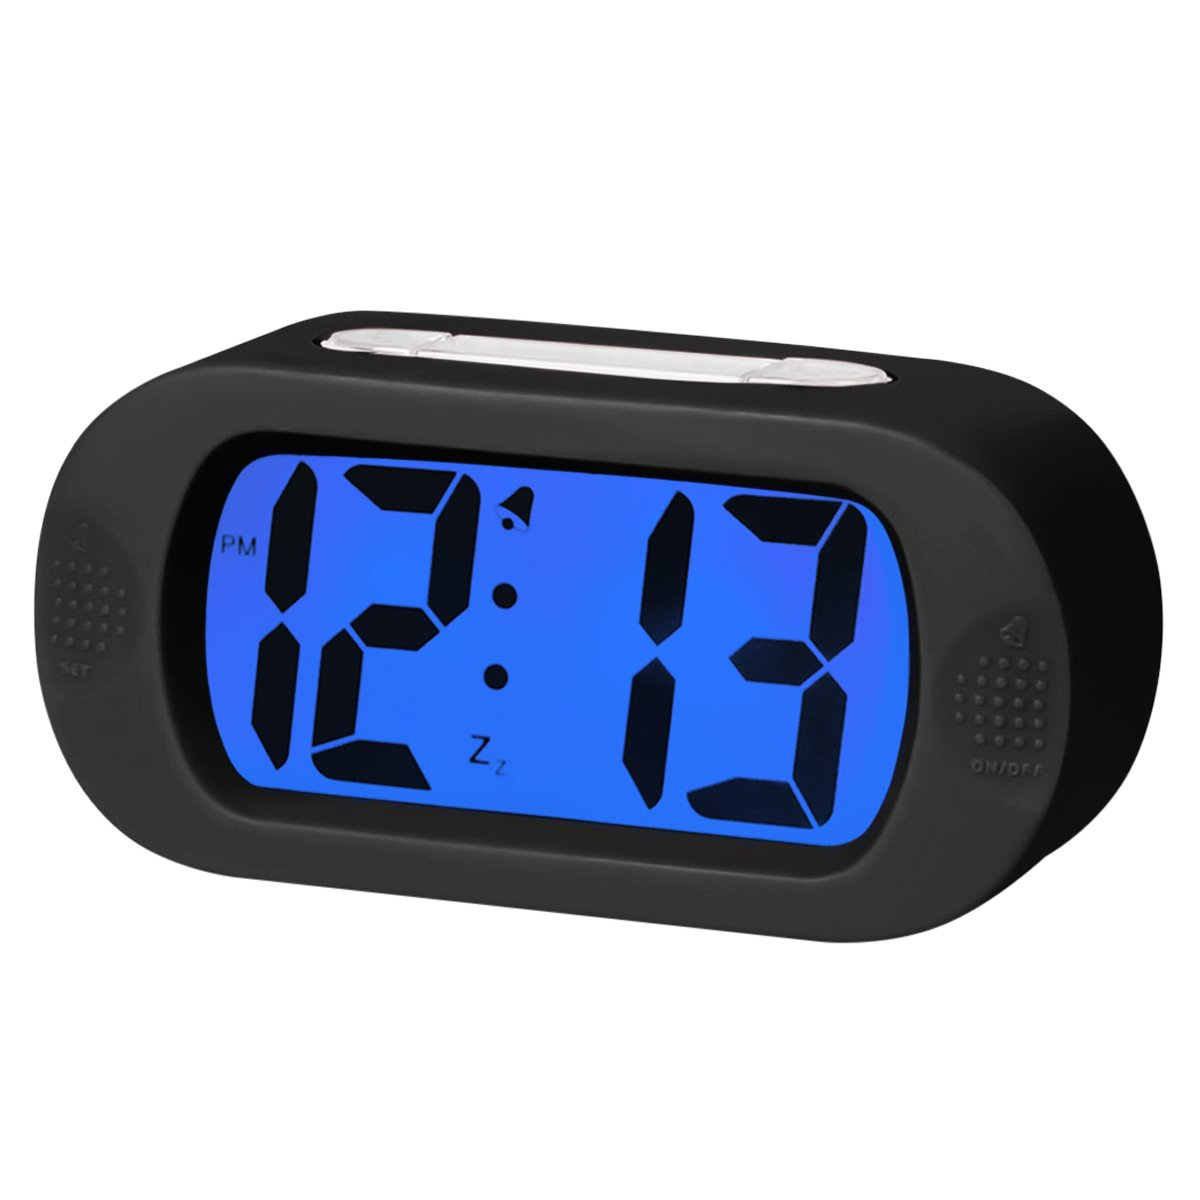 Sveglia Digitale Da Comodino Elettrica.Easehome Sveglia Digitale In Silicone Sveglie Da Comodino Sveglia Ebay